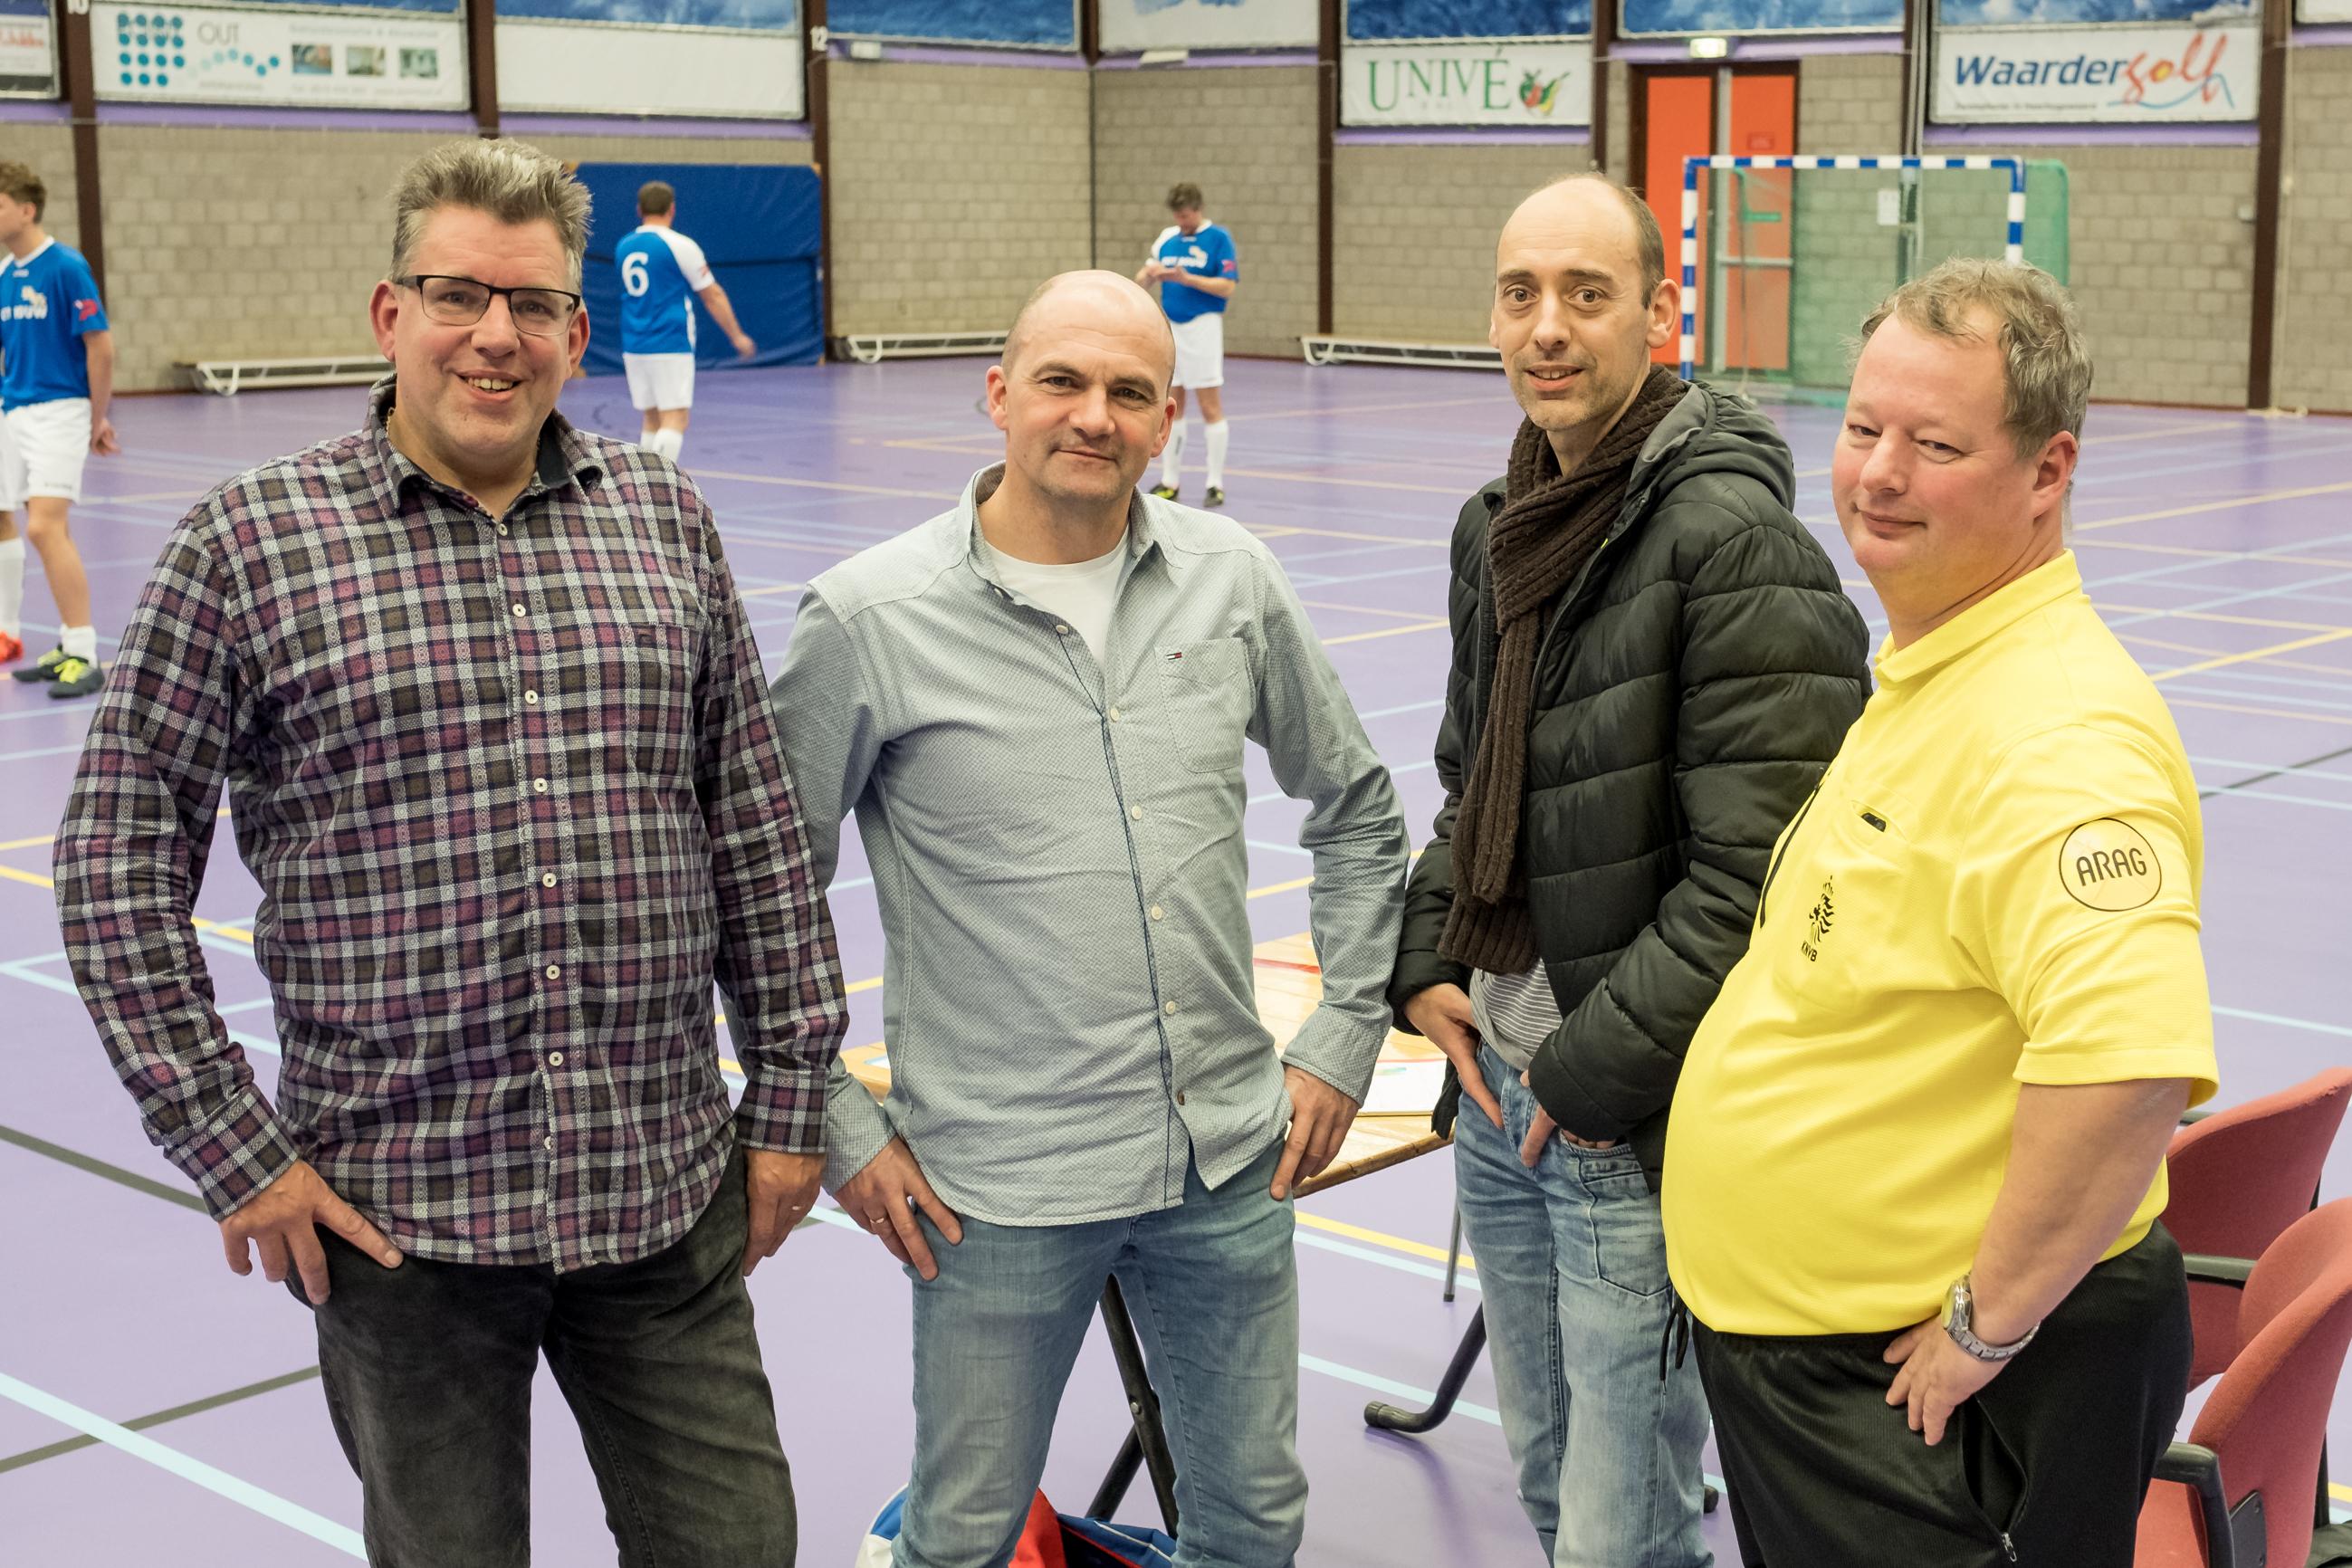 Vlnr. Catharinus Dijkstra (pr-medewerker stichting Recreatiezaalvoetbal), Richard van Avezaath, Gareth Jenkins (beiden zaaldienst) en scheidsrechter Michel Ros. (foto Richard Rood)